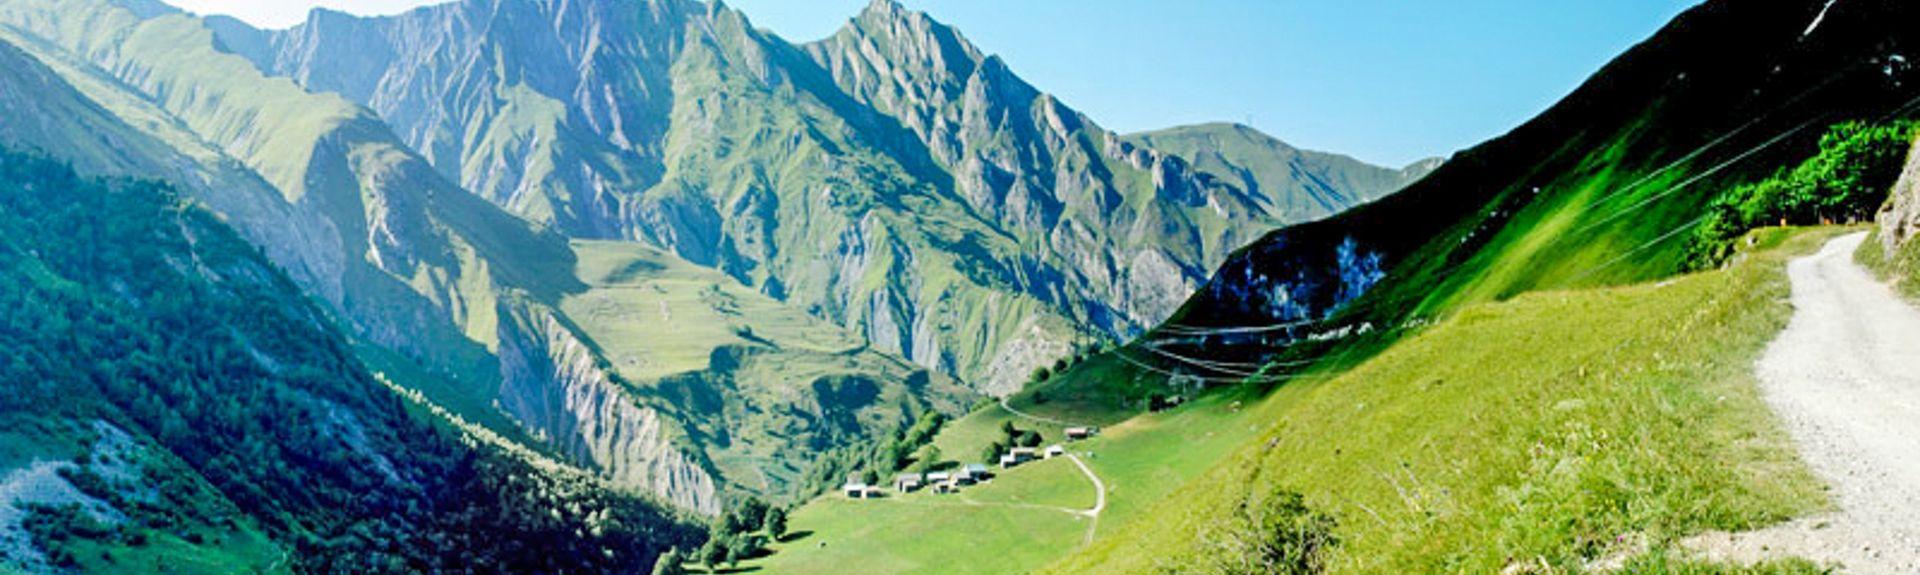 Val-Thorens, Saint-Martin-de-Belleville, Auvergne - Rhône - Alpes, Frankrike